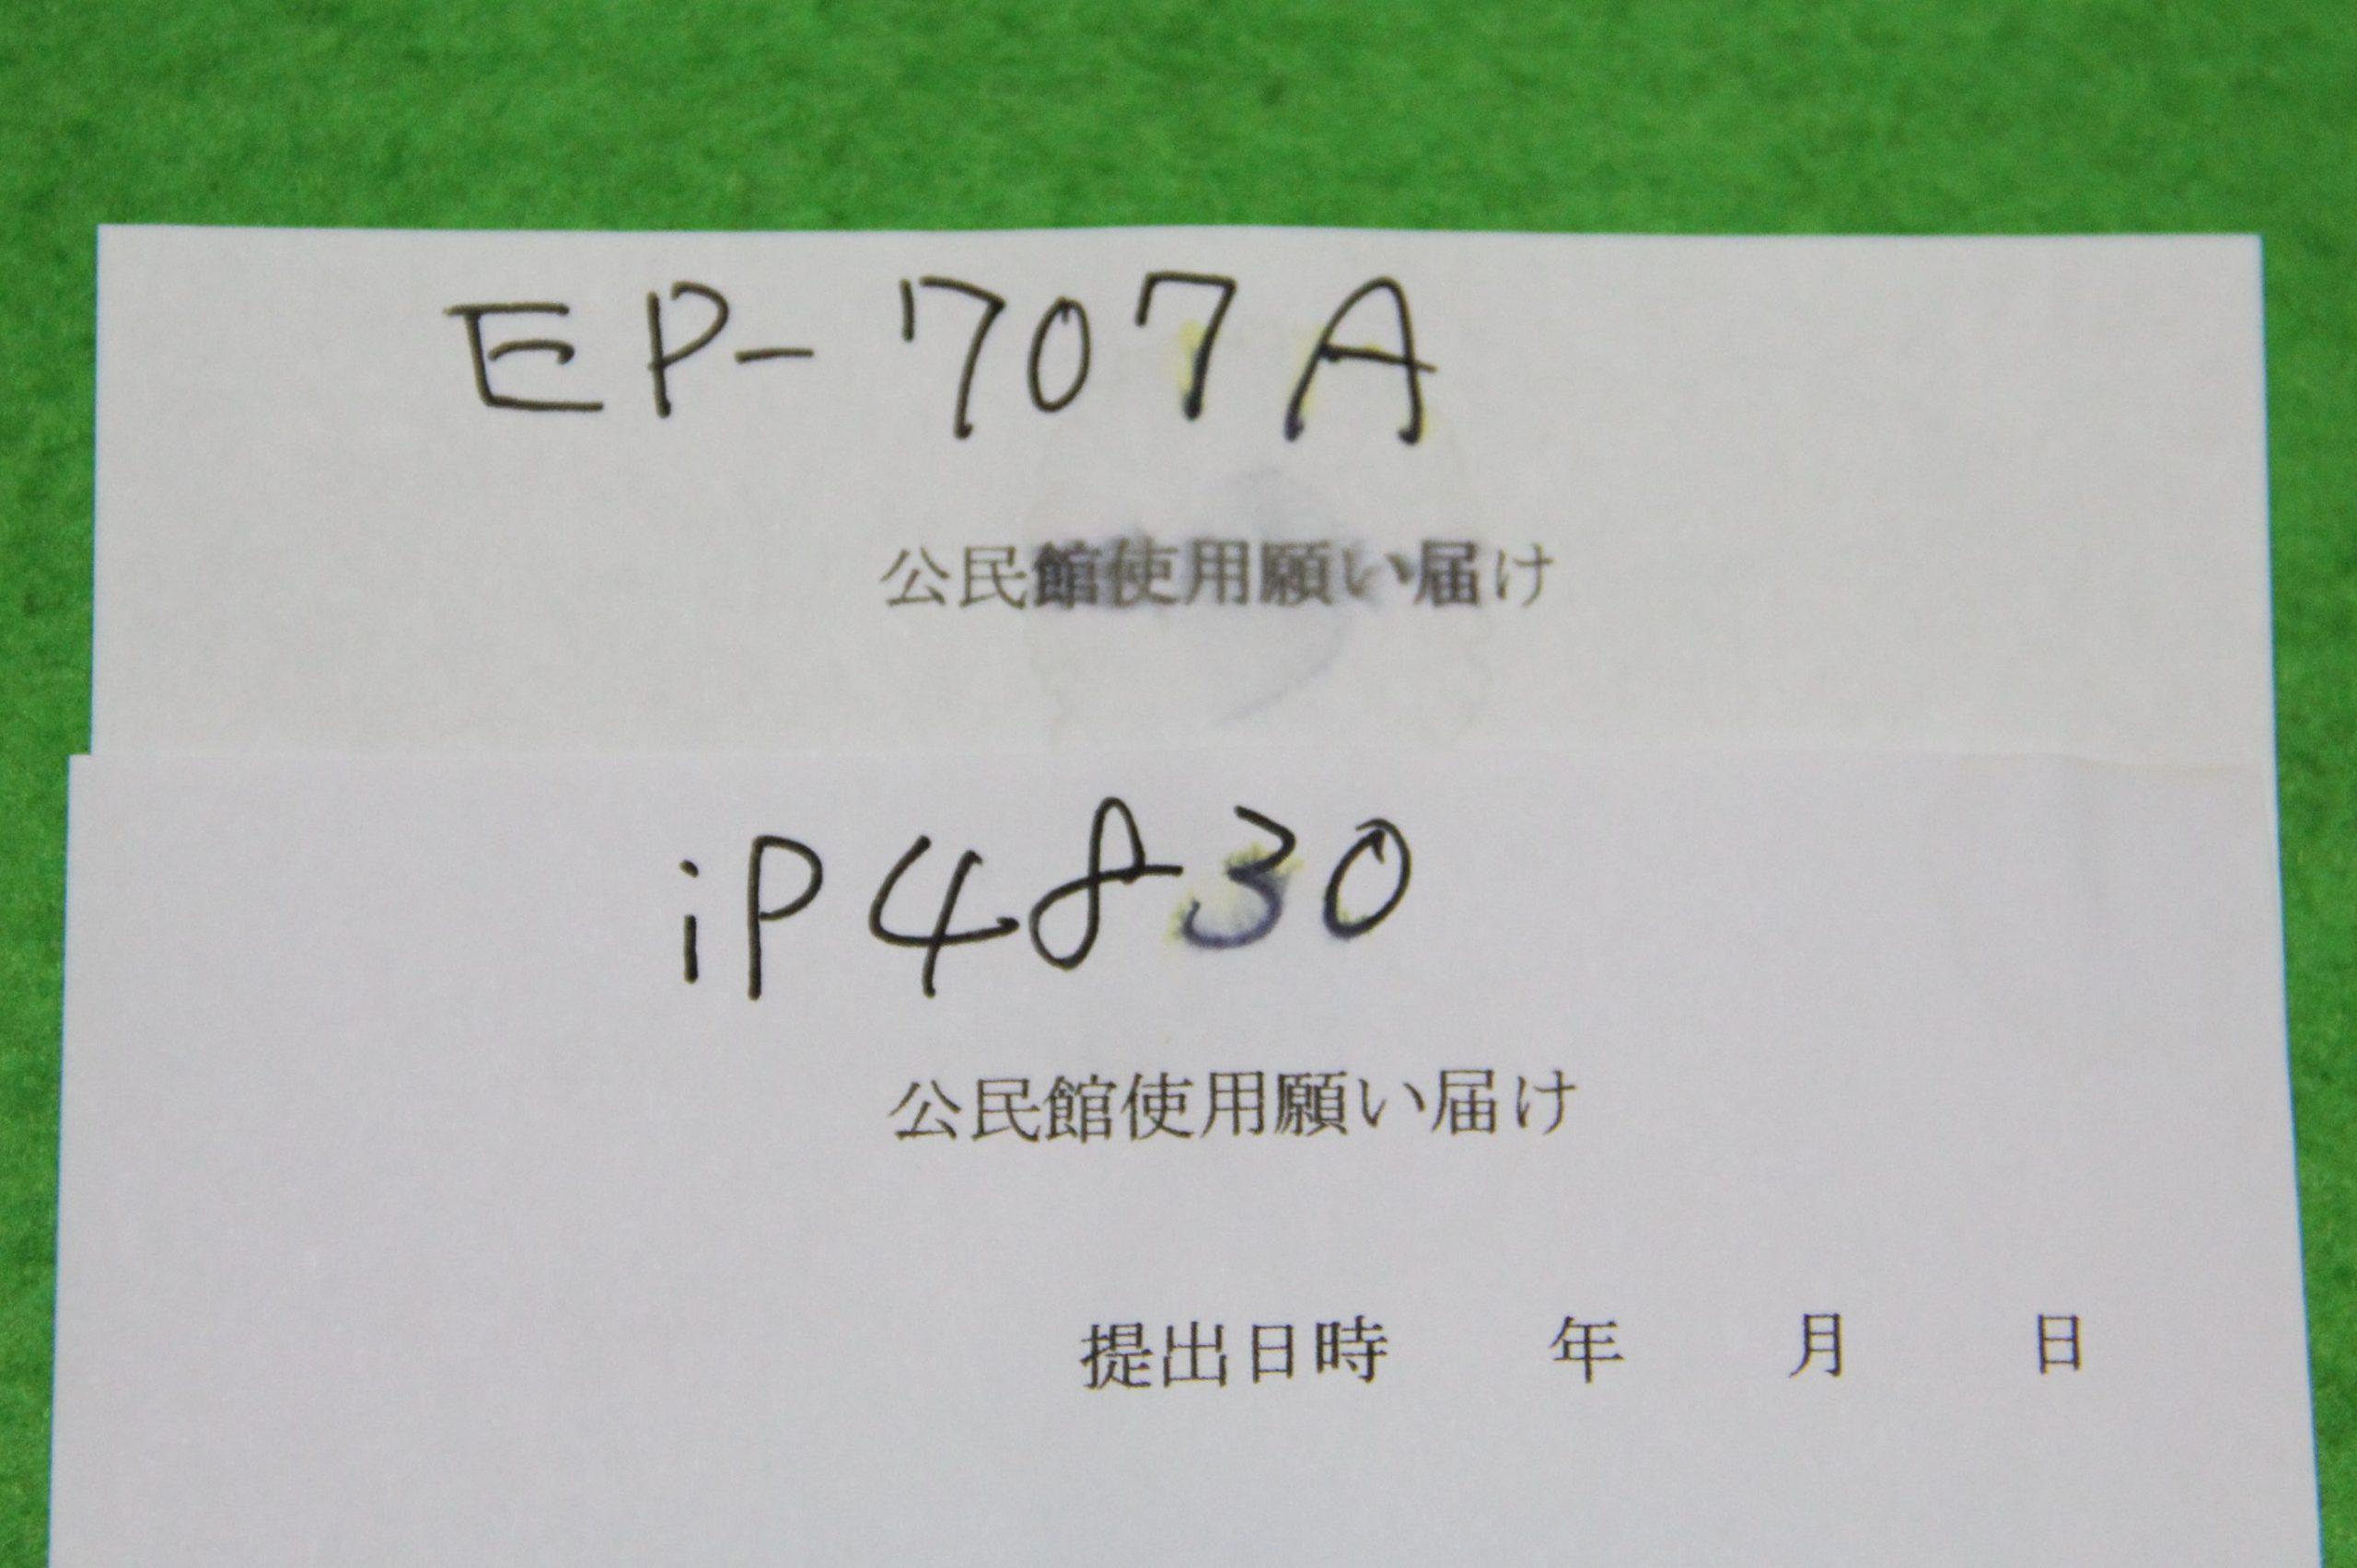 iP4830 vs EP-707A